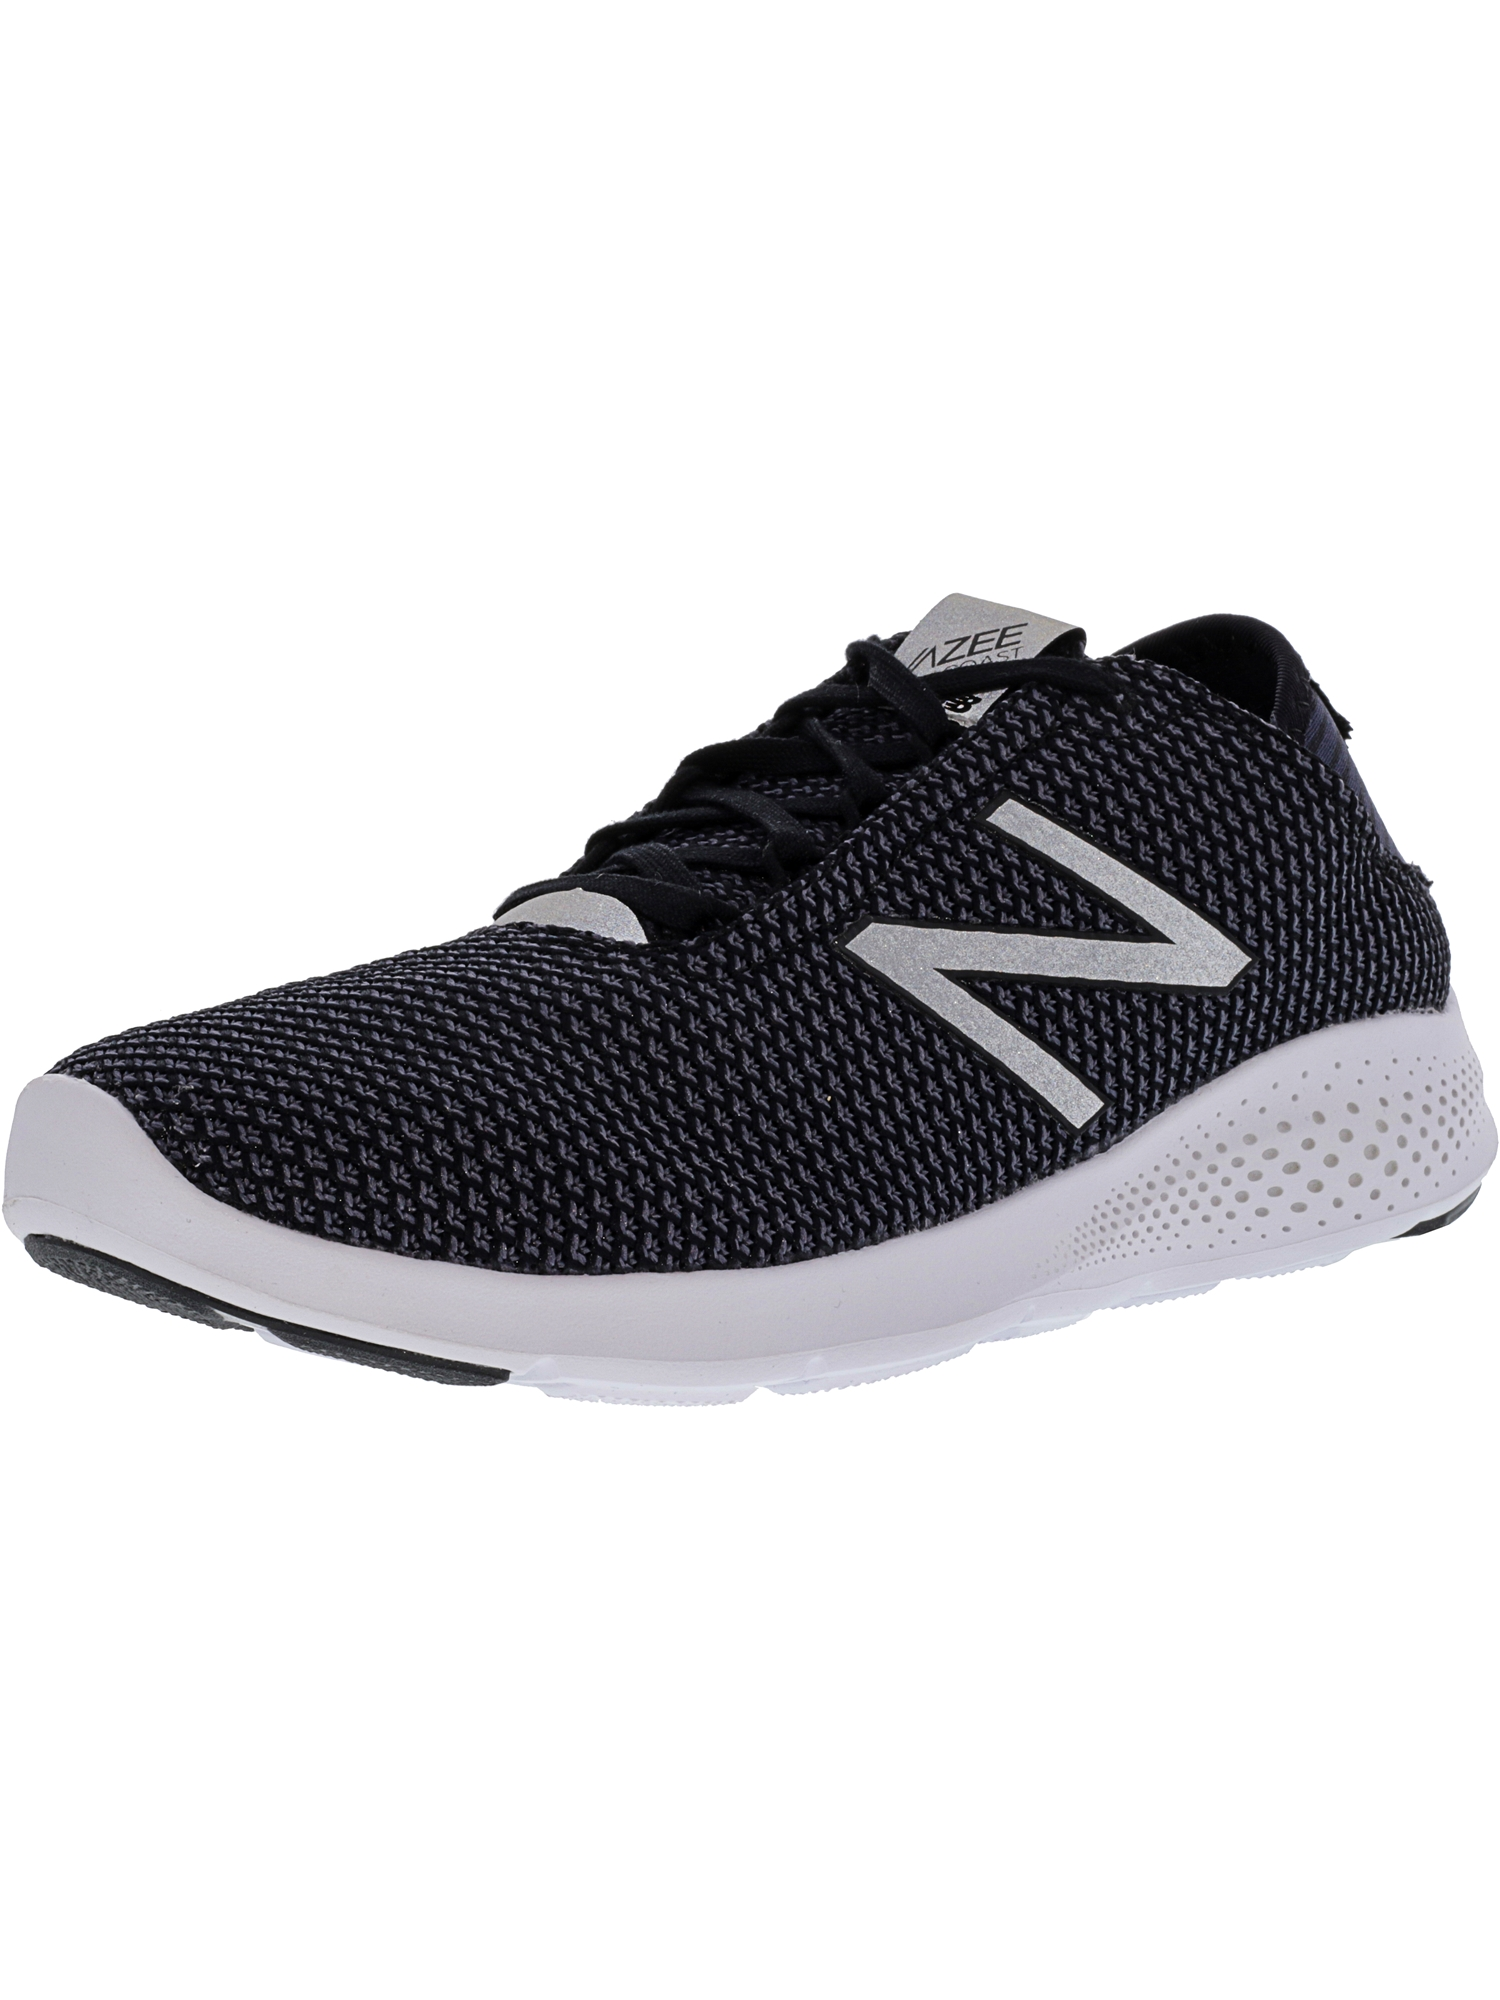 New Balance Women's Wcoas Bk2 Suede Running Shoe 8.5M by New Balance